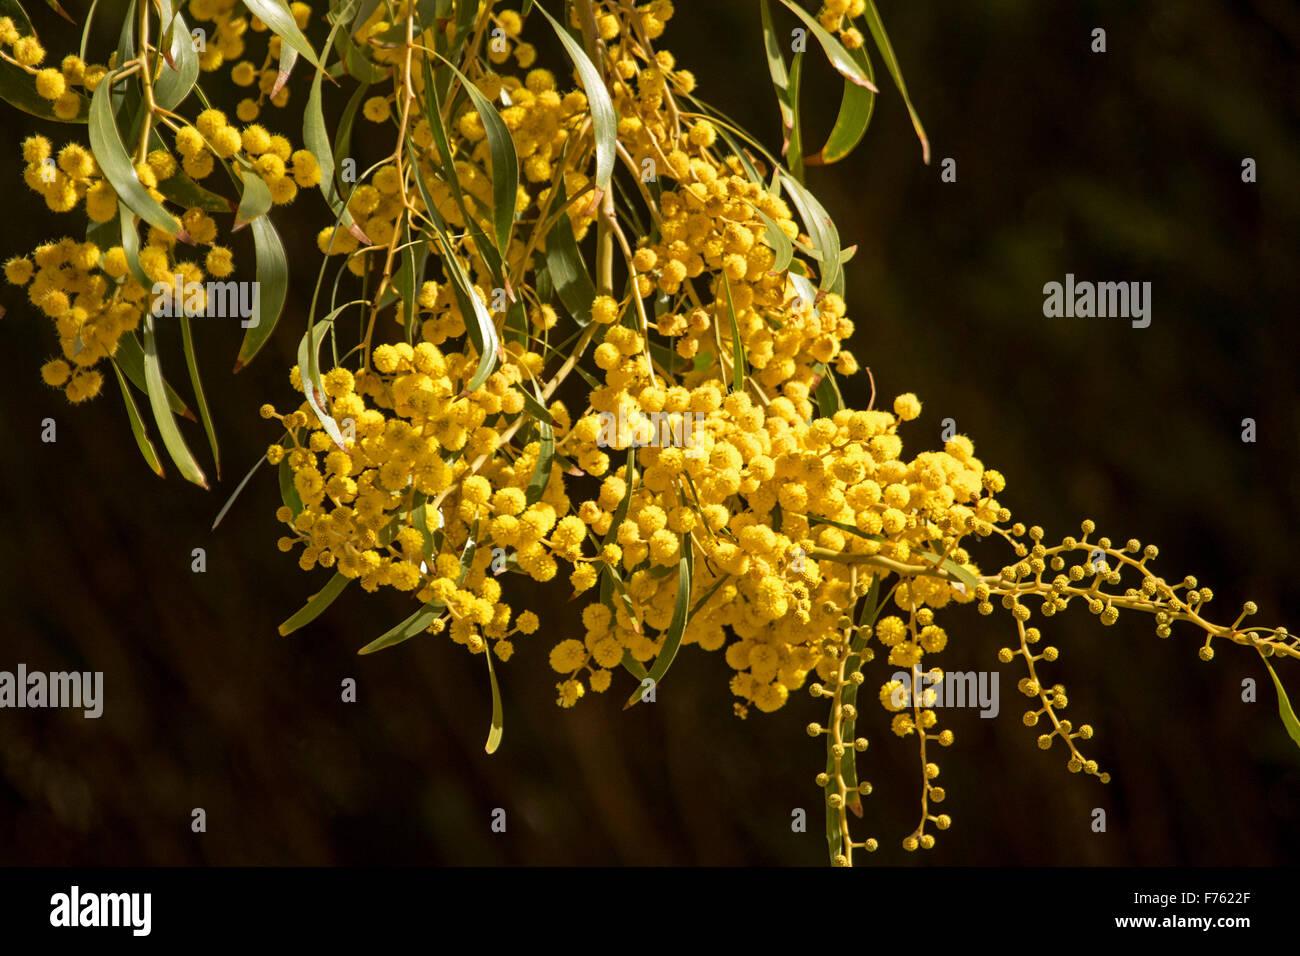 Cluster of golden yellow flowers green leaves of acacia pycnantha cluster of golden yellow flowers green leaves of acacia pycnantha australian wattle beautiful wildflowers on dark background mightylinksfo